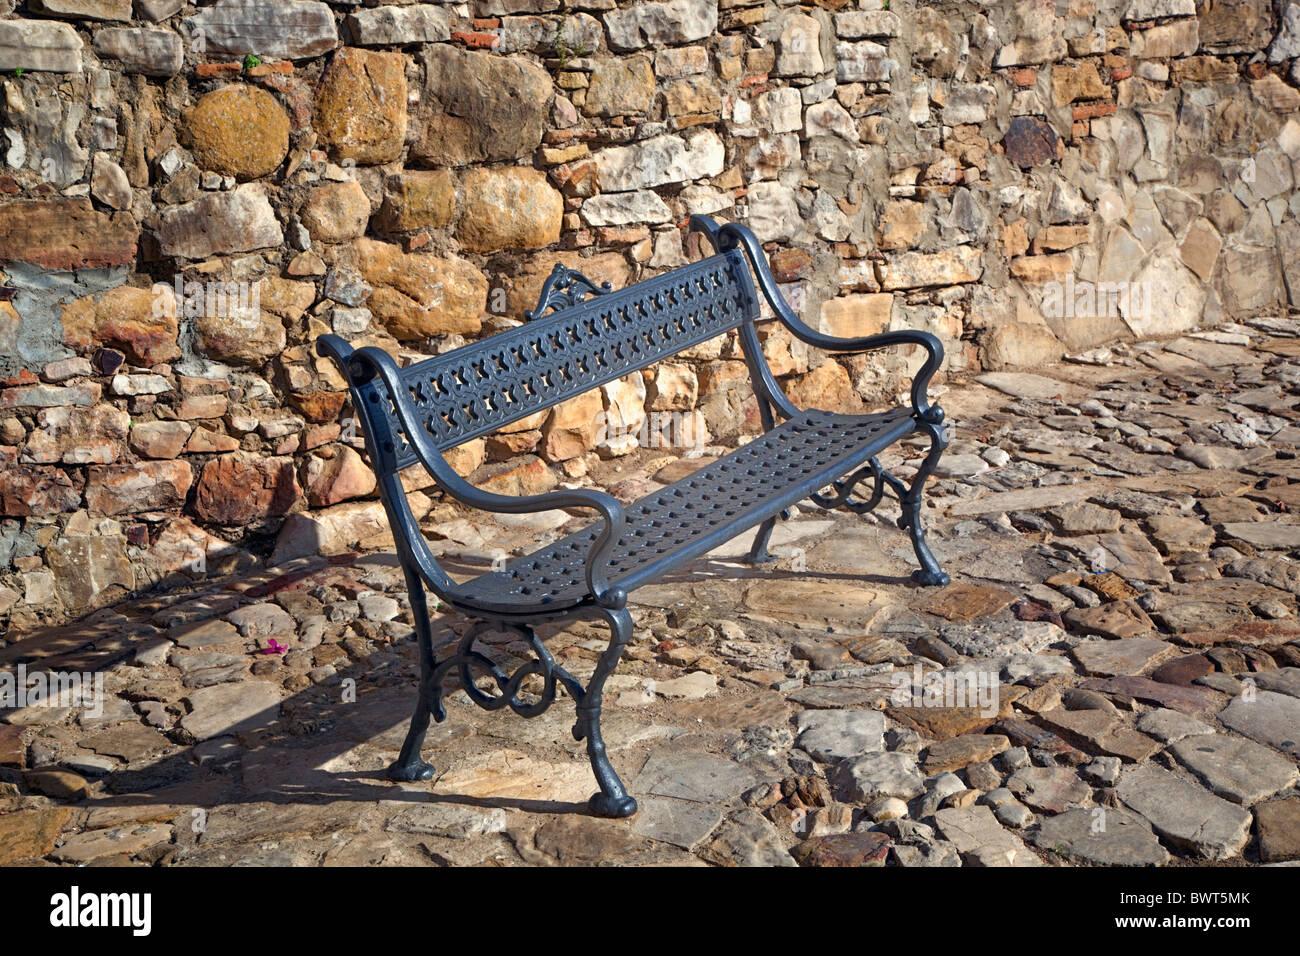 Public bench in street of Castellar de la Frontera, Cadiz Province, Spain. - Stock Image